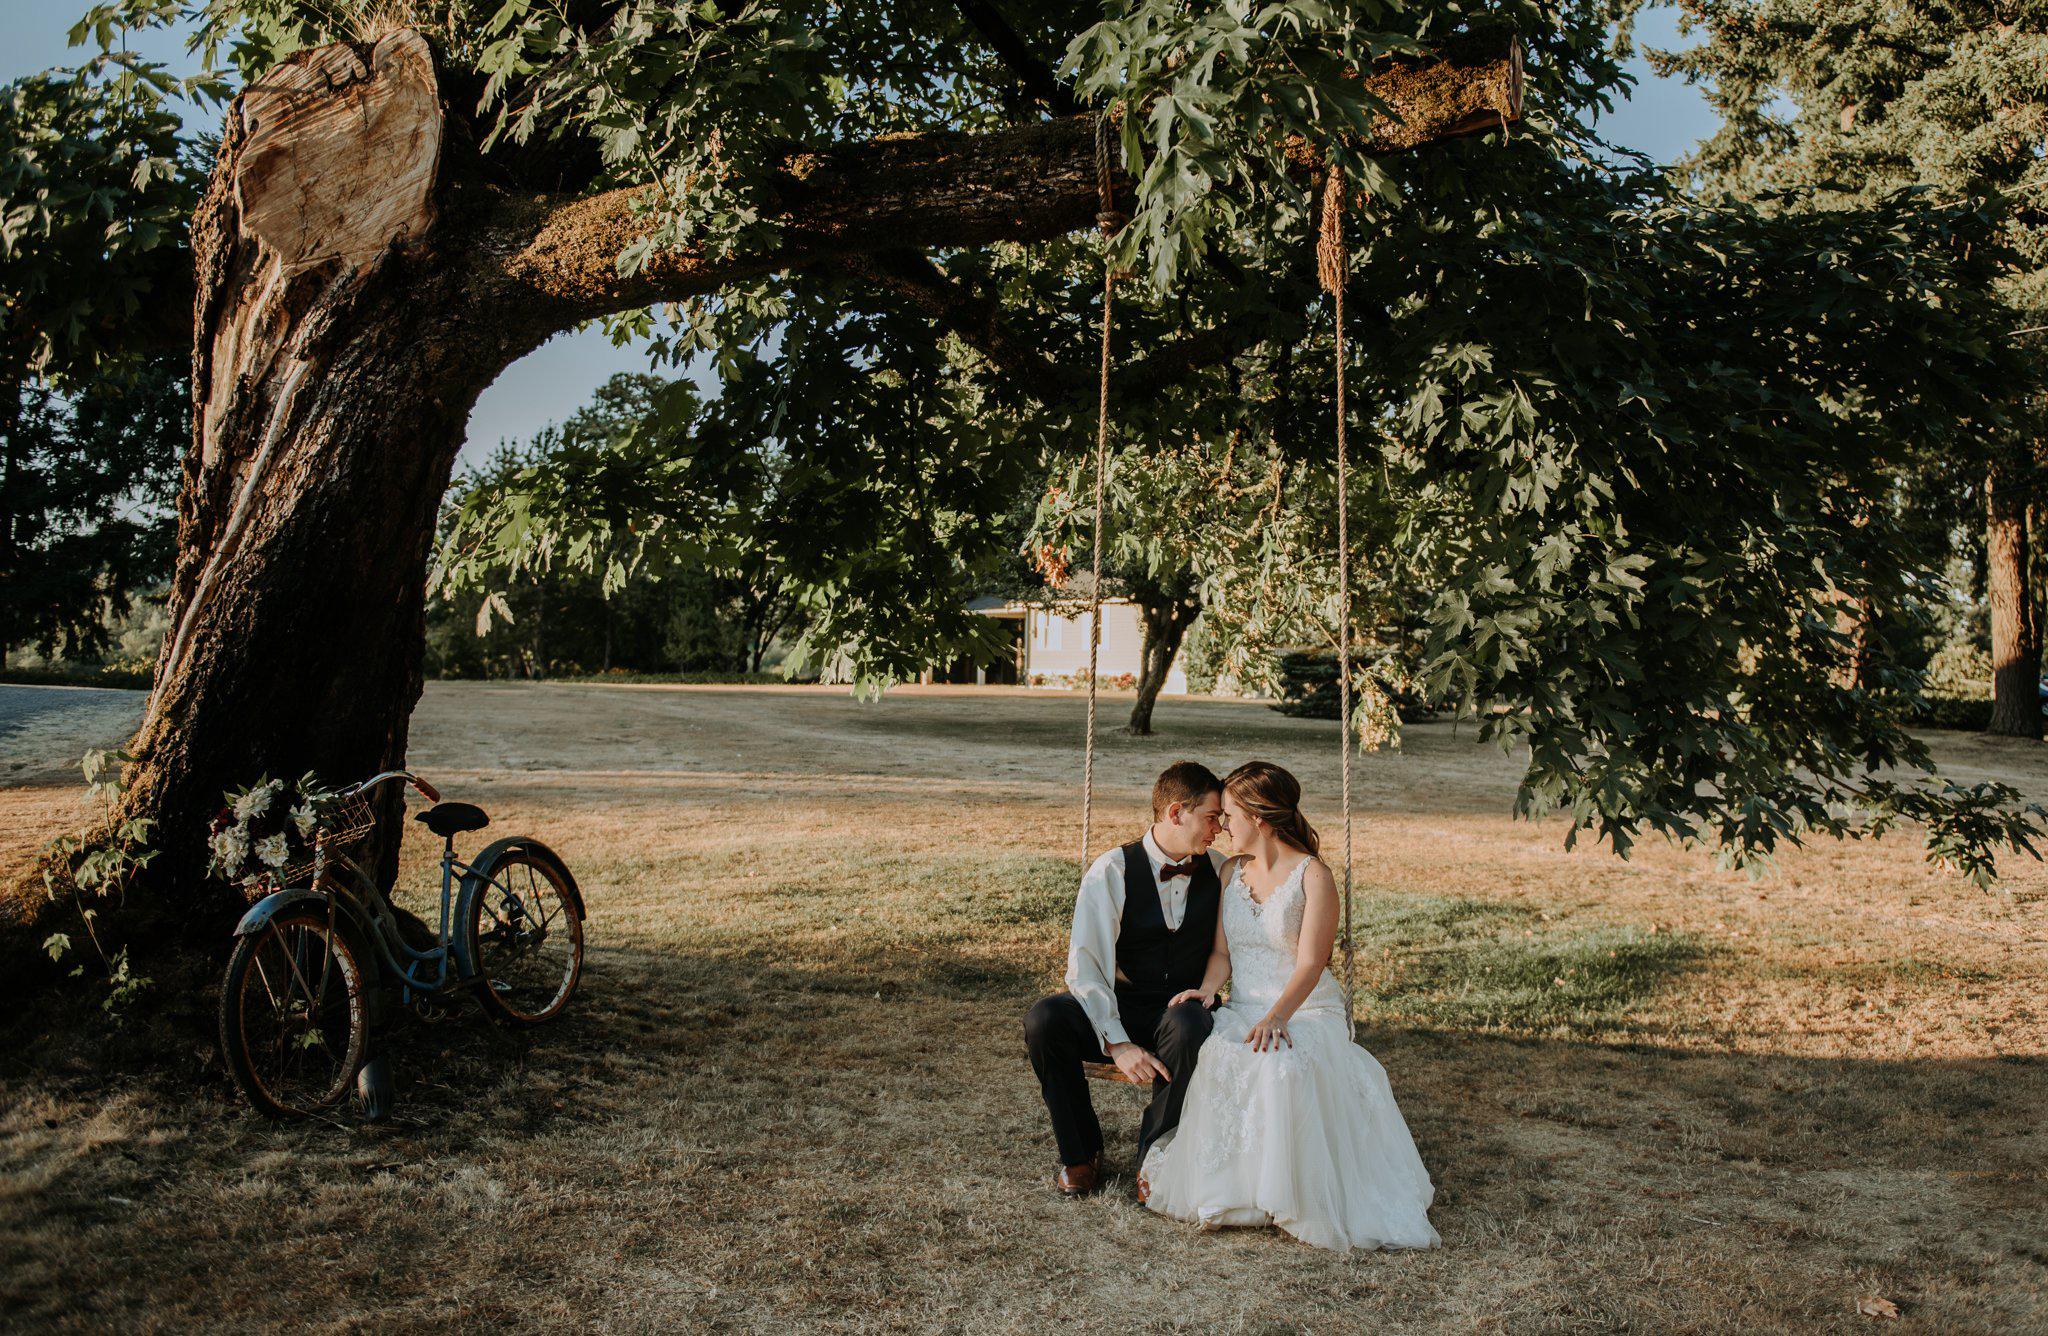 kristen-and-cody-the-kelley-farm-wedding-seattle-photographer-caitlyn-nikula-89.jpg